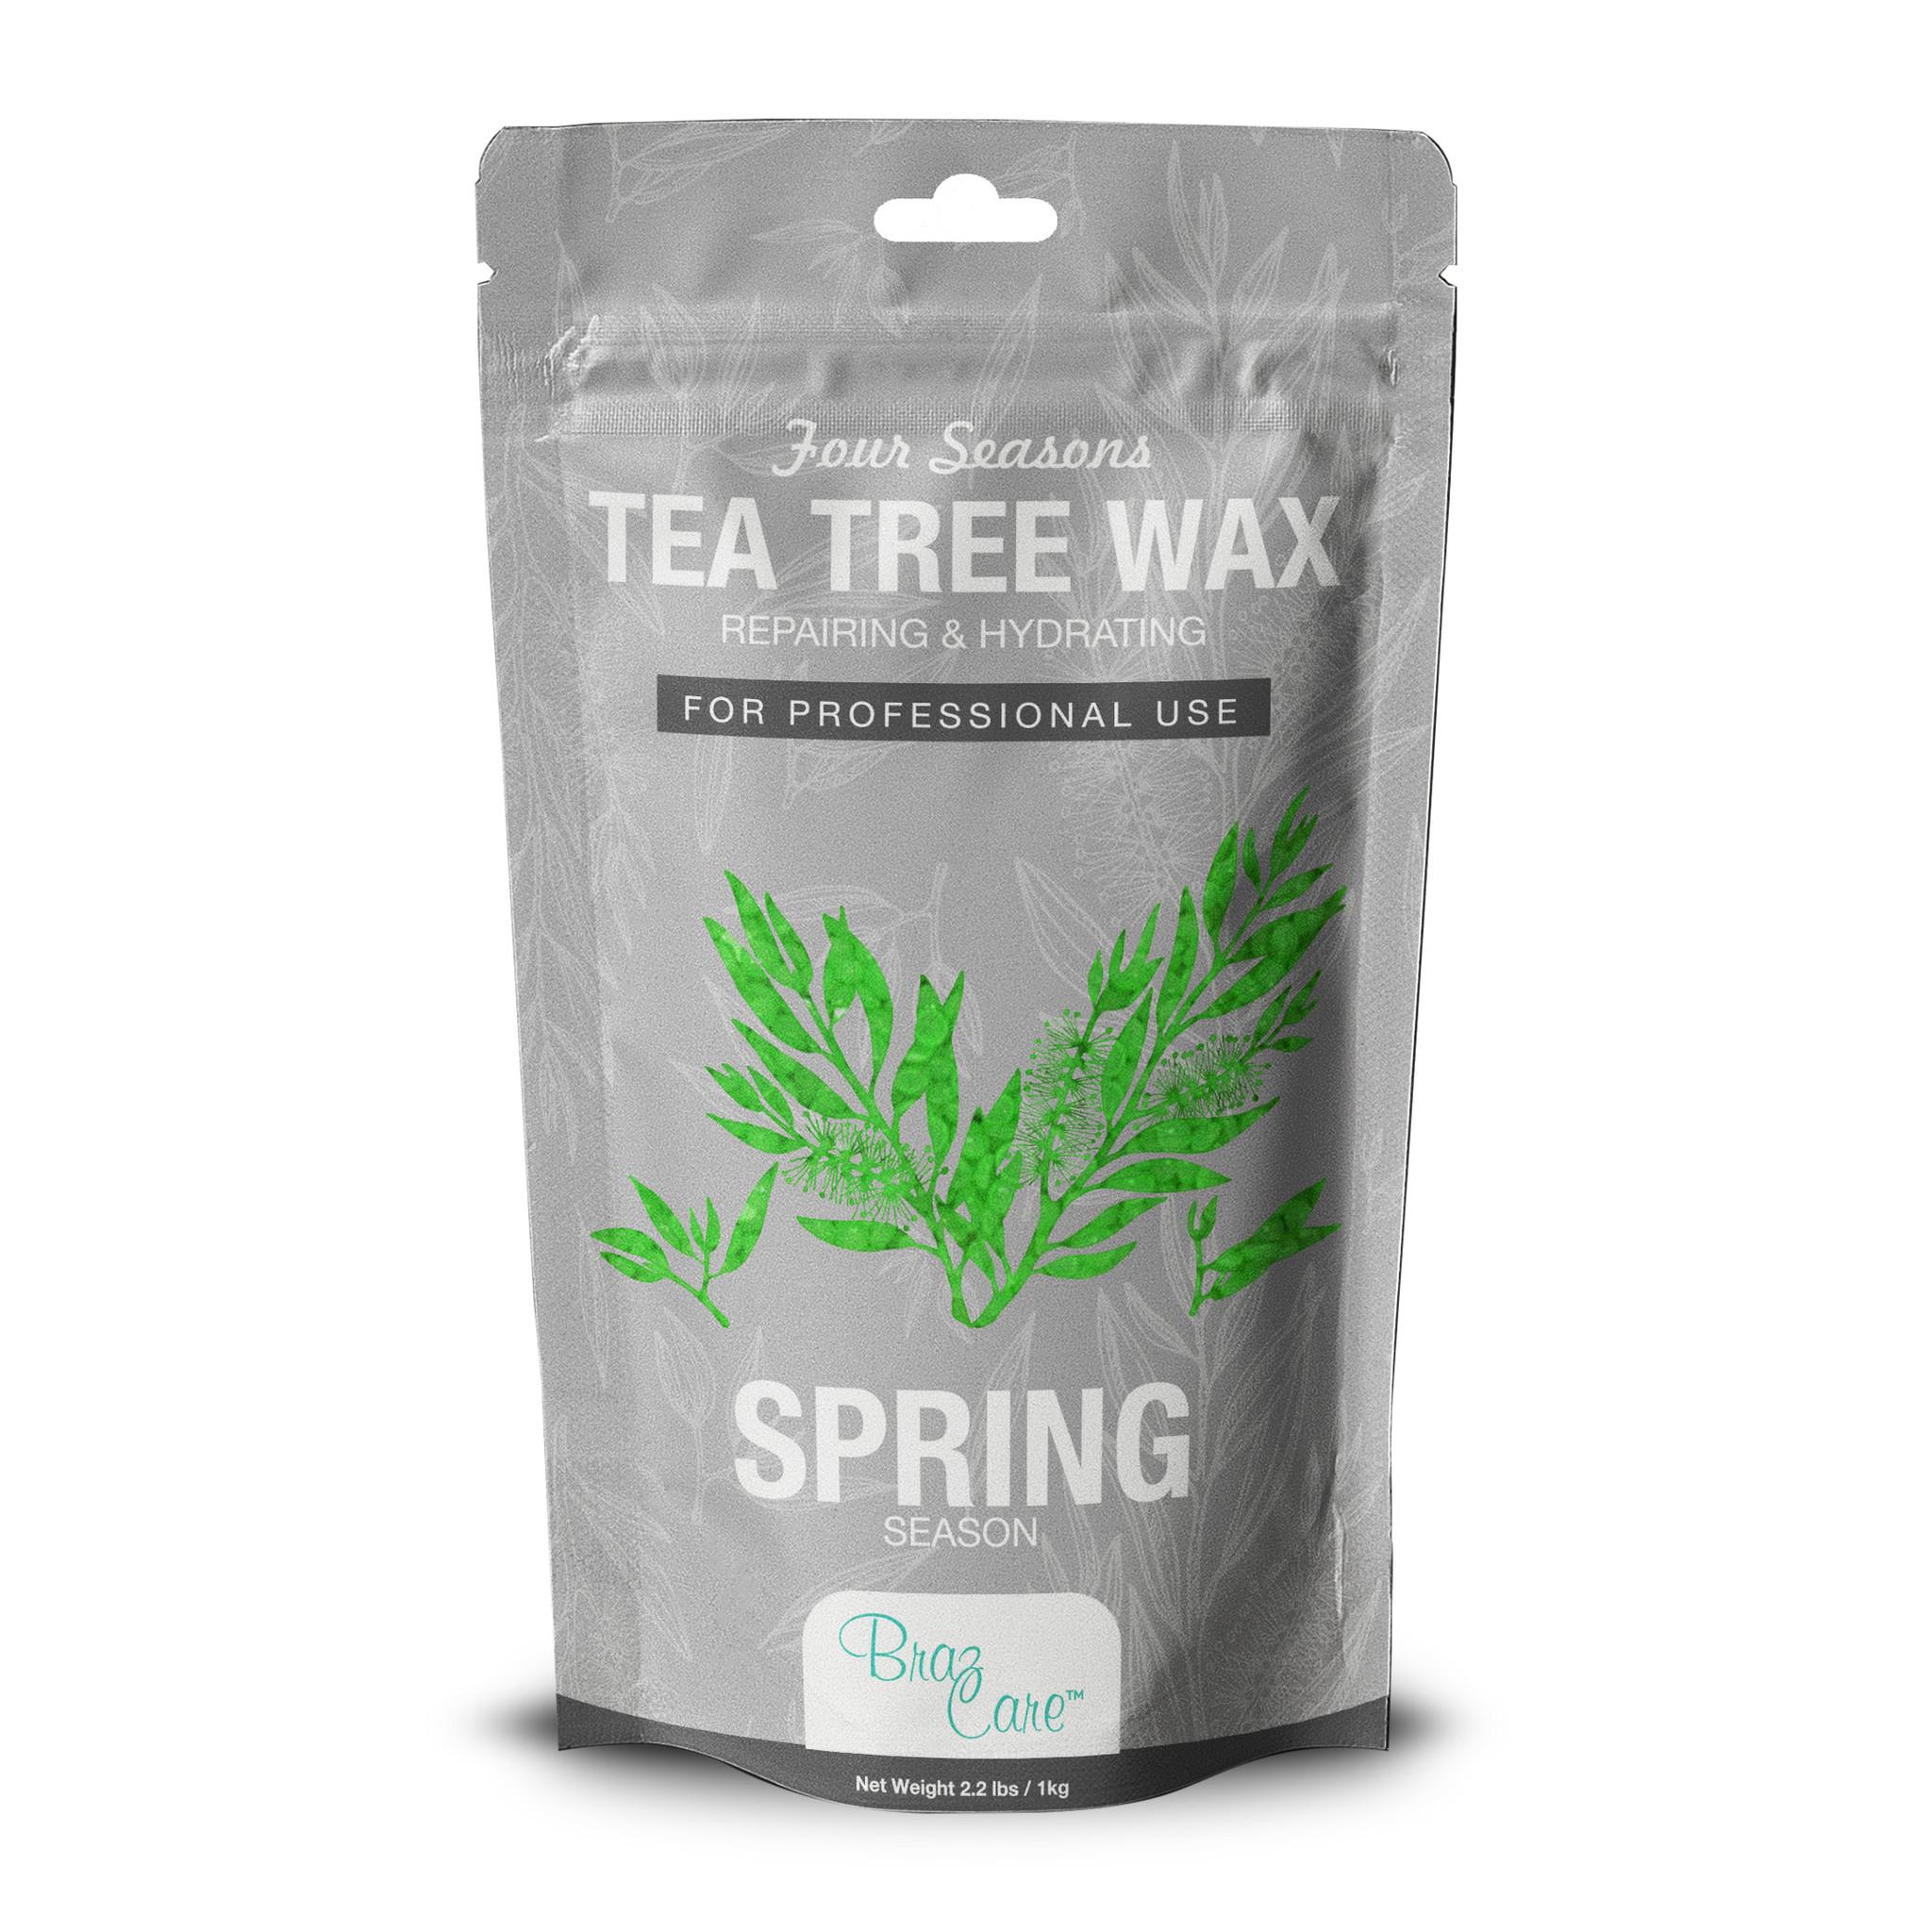 Hard Wax Tea Tree 2.2lb - Box of 12 units ($12.90/Ea)